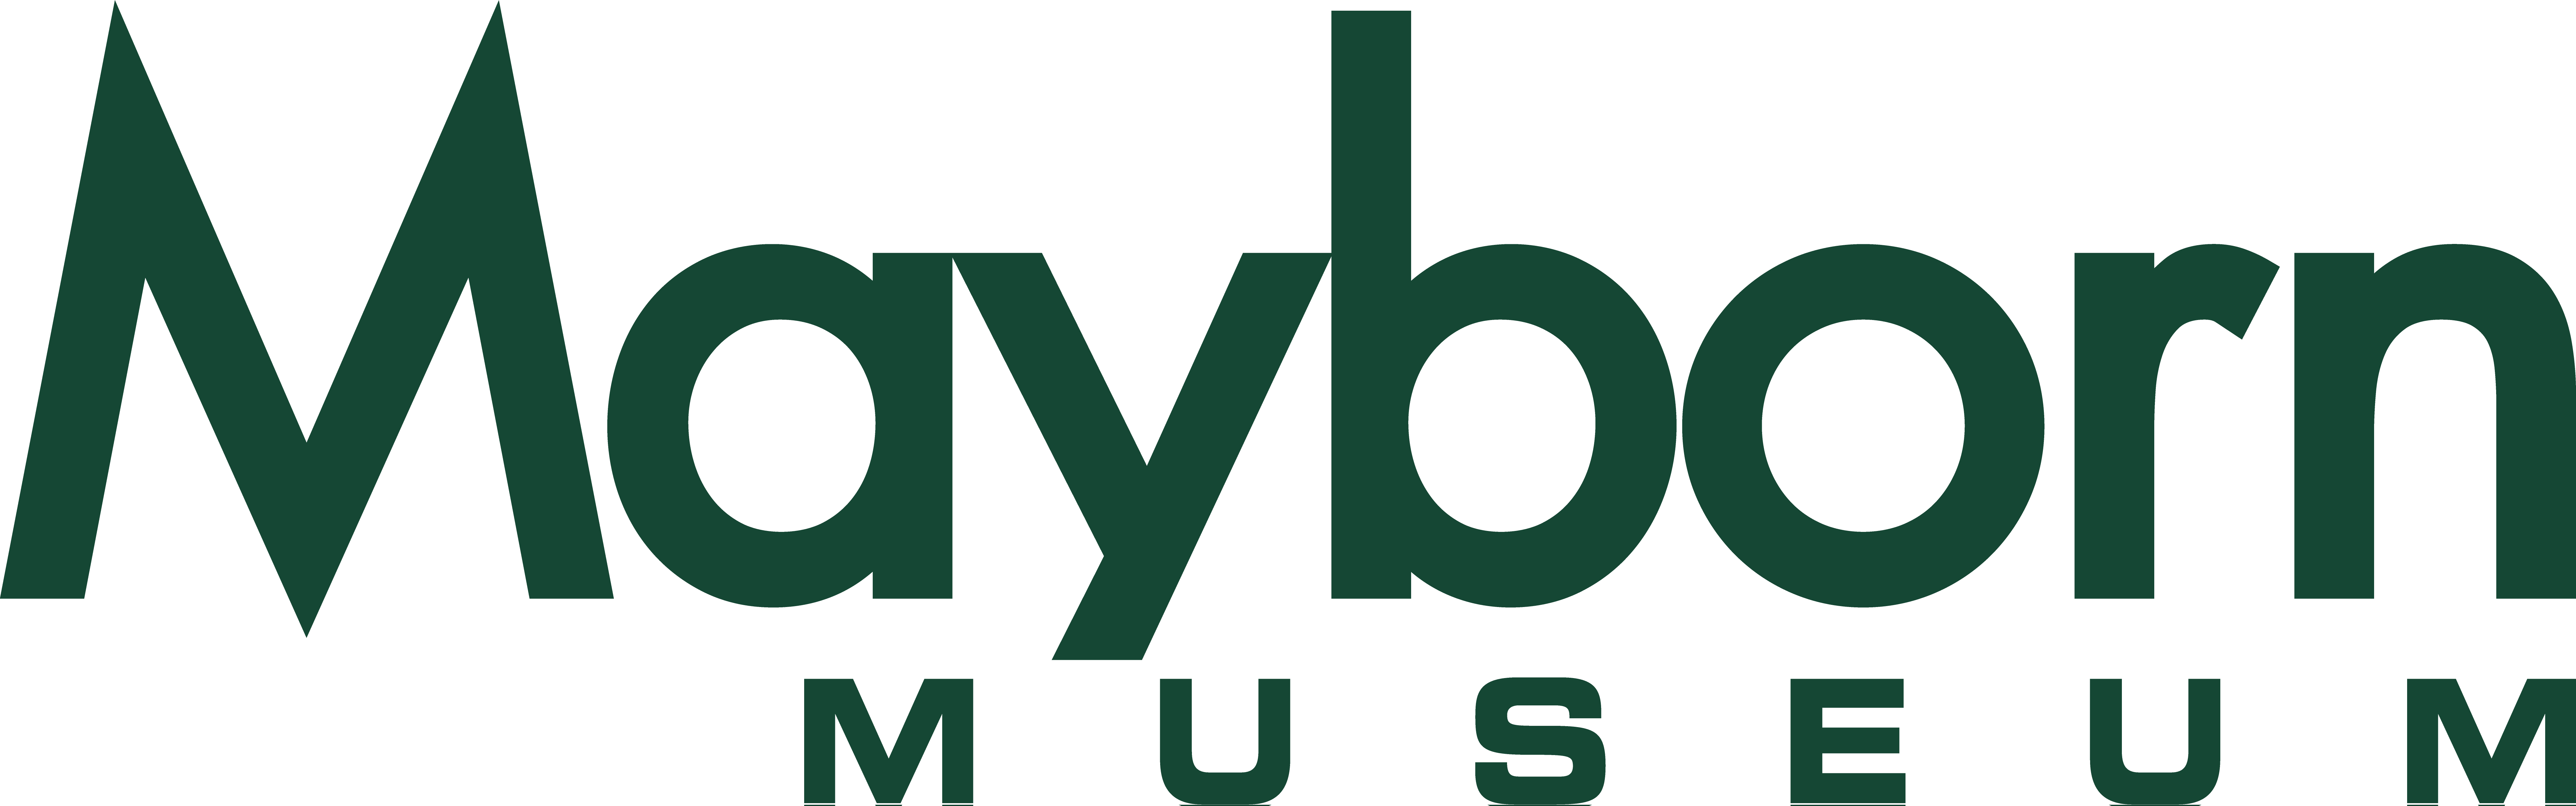 Mayborn Museum logo